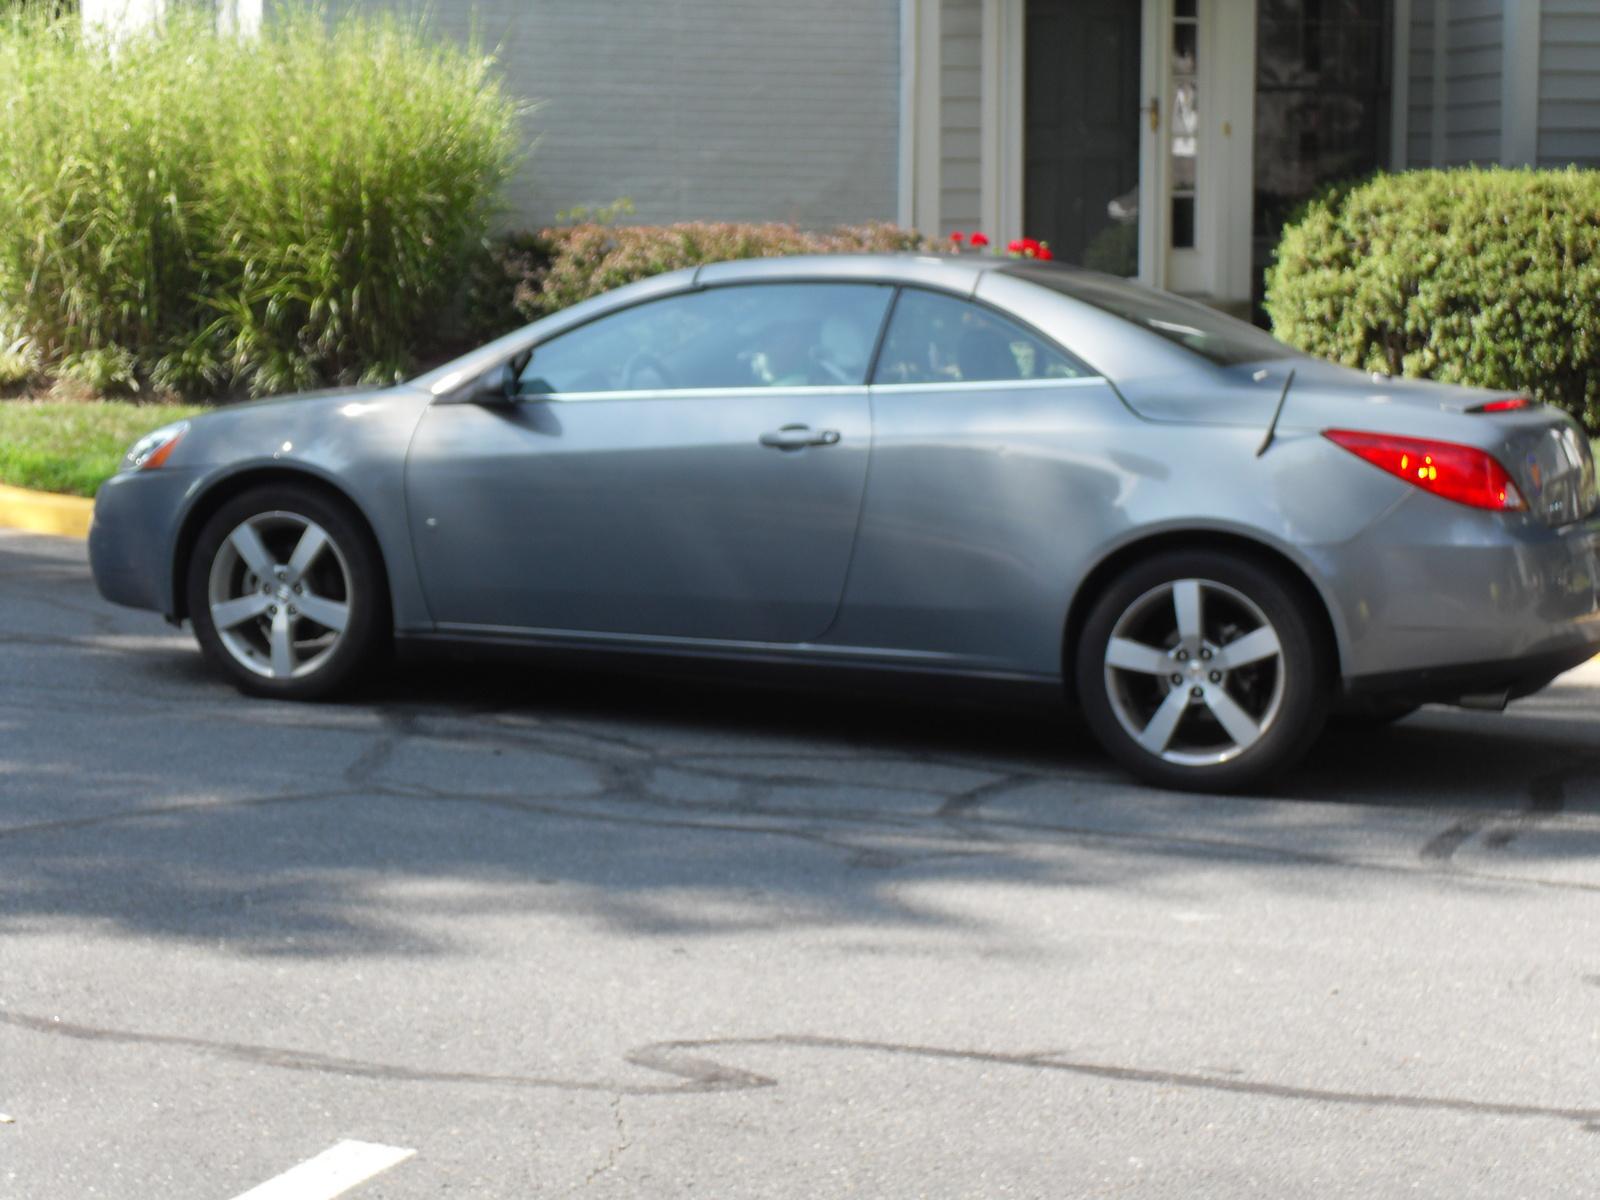 2007 Pontiac G6 - Exterior Pictures